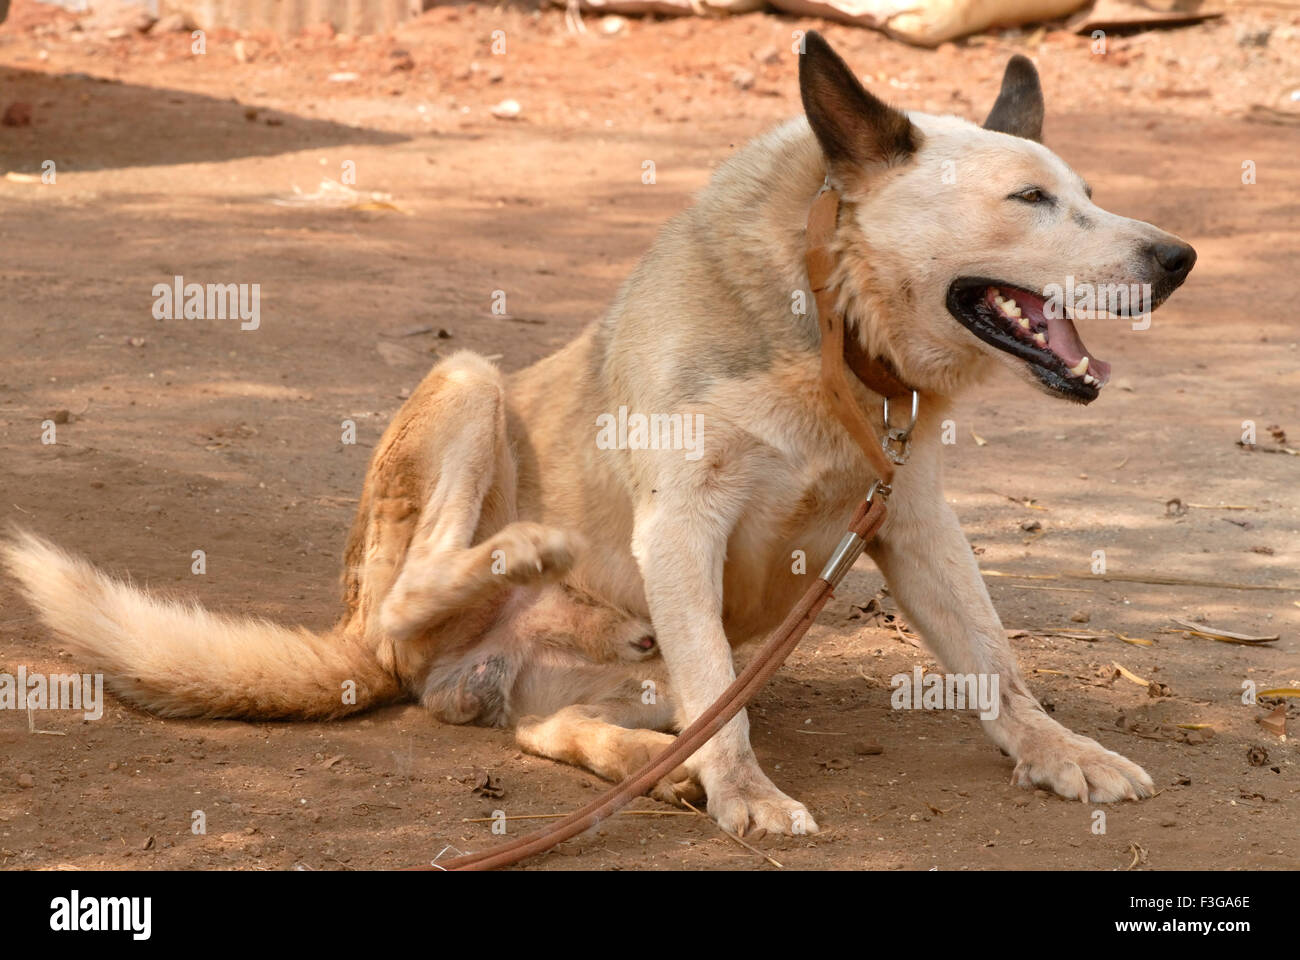 Country dog scratching and tied with belt ; Jambhulwadi ; Pen ; Raigad District ; Maharashtra ; India - Stock Image